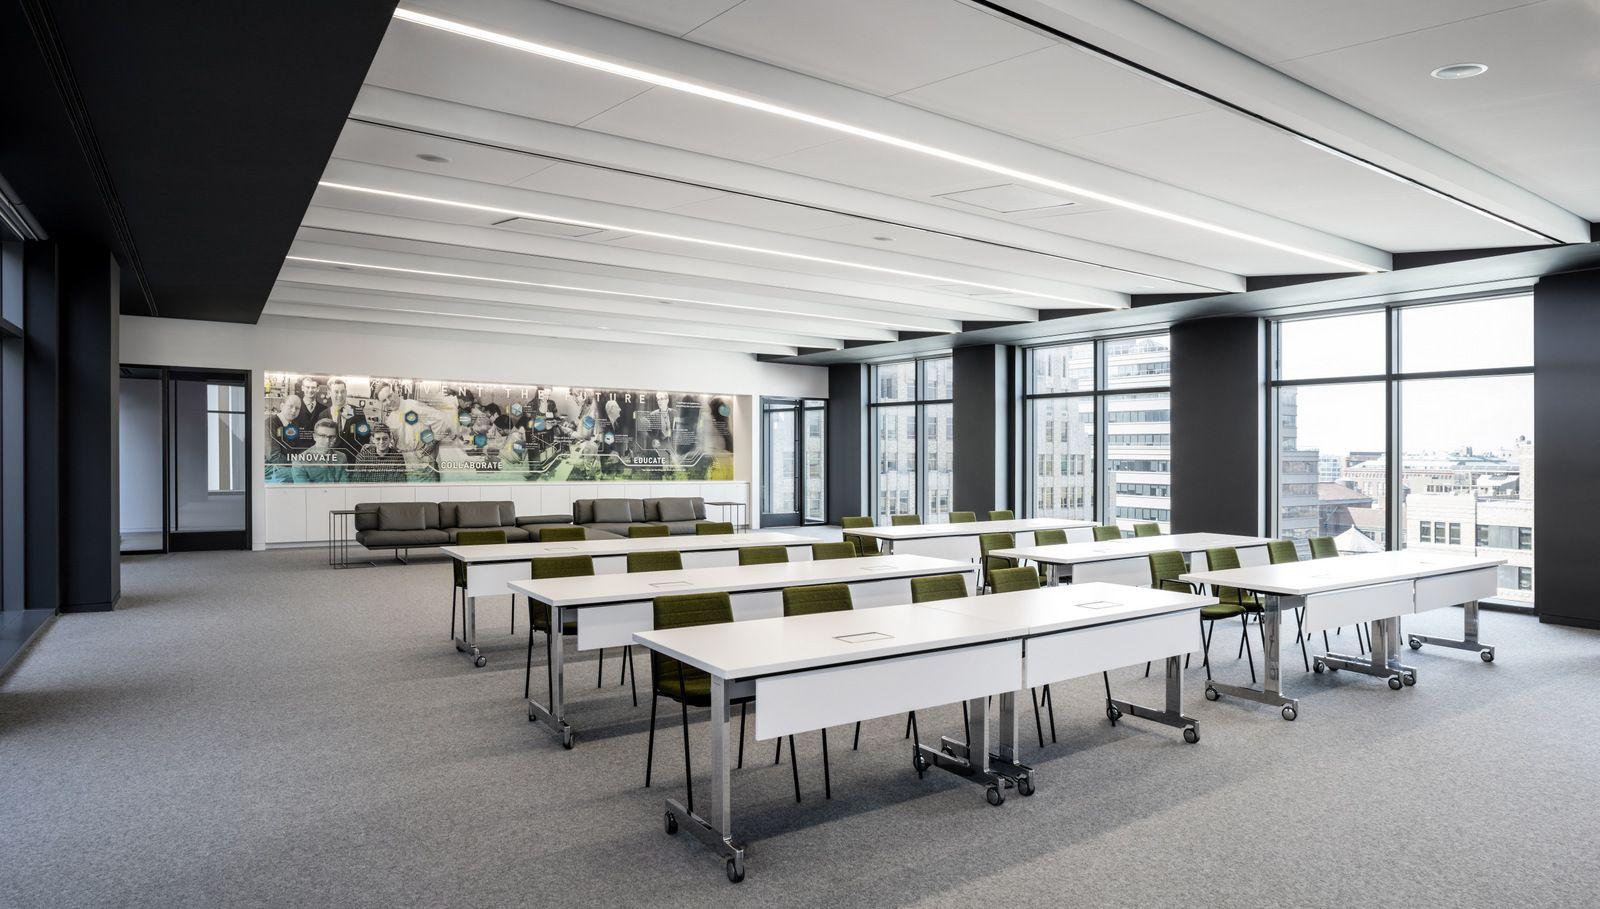 Training Room Design Ideas Part - 34: Training Room | Biotronik Offices U2013 New York City